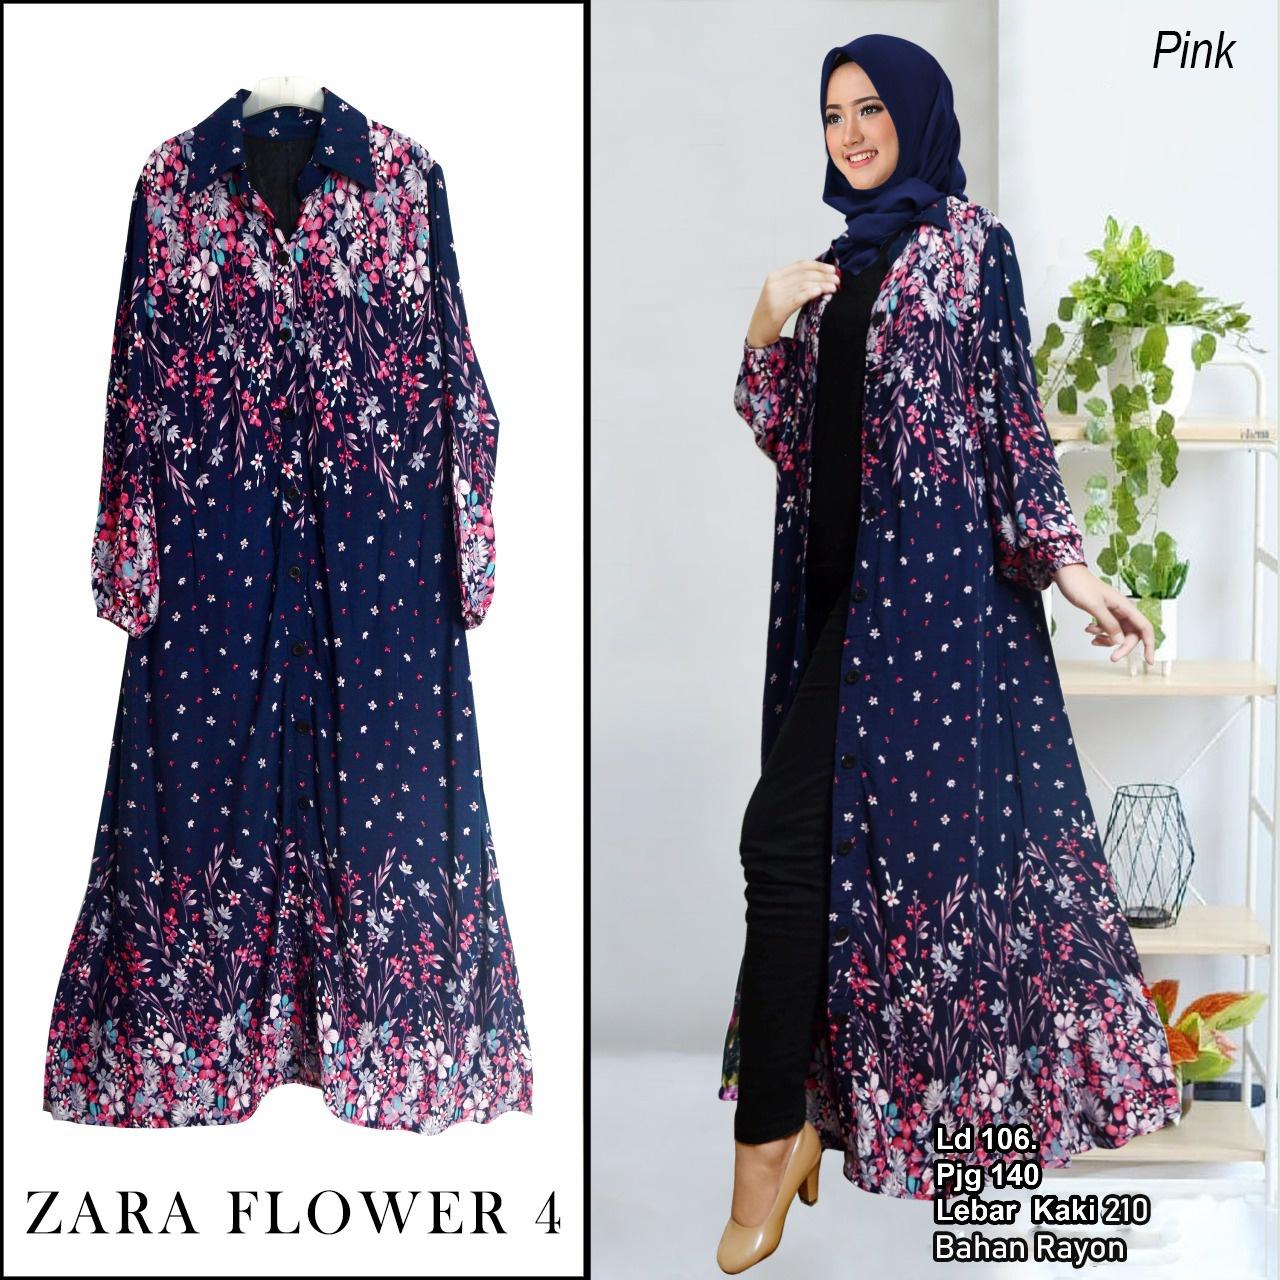 central gamis / koleksi Zara long cardigan outer flower / maxi dress /  first hand / first supplier